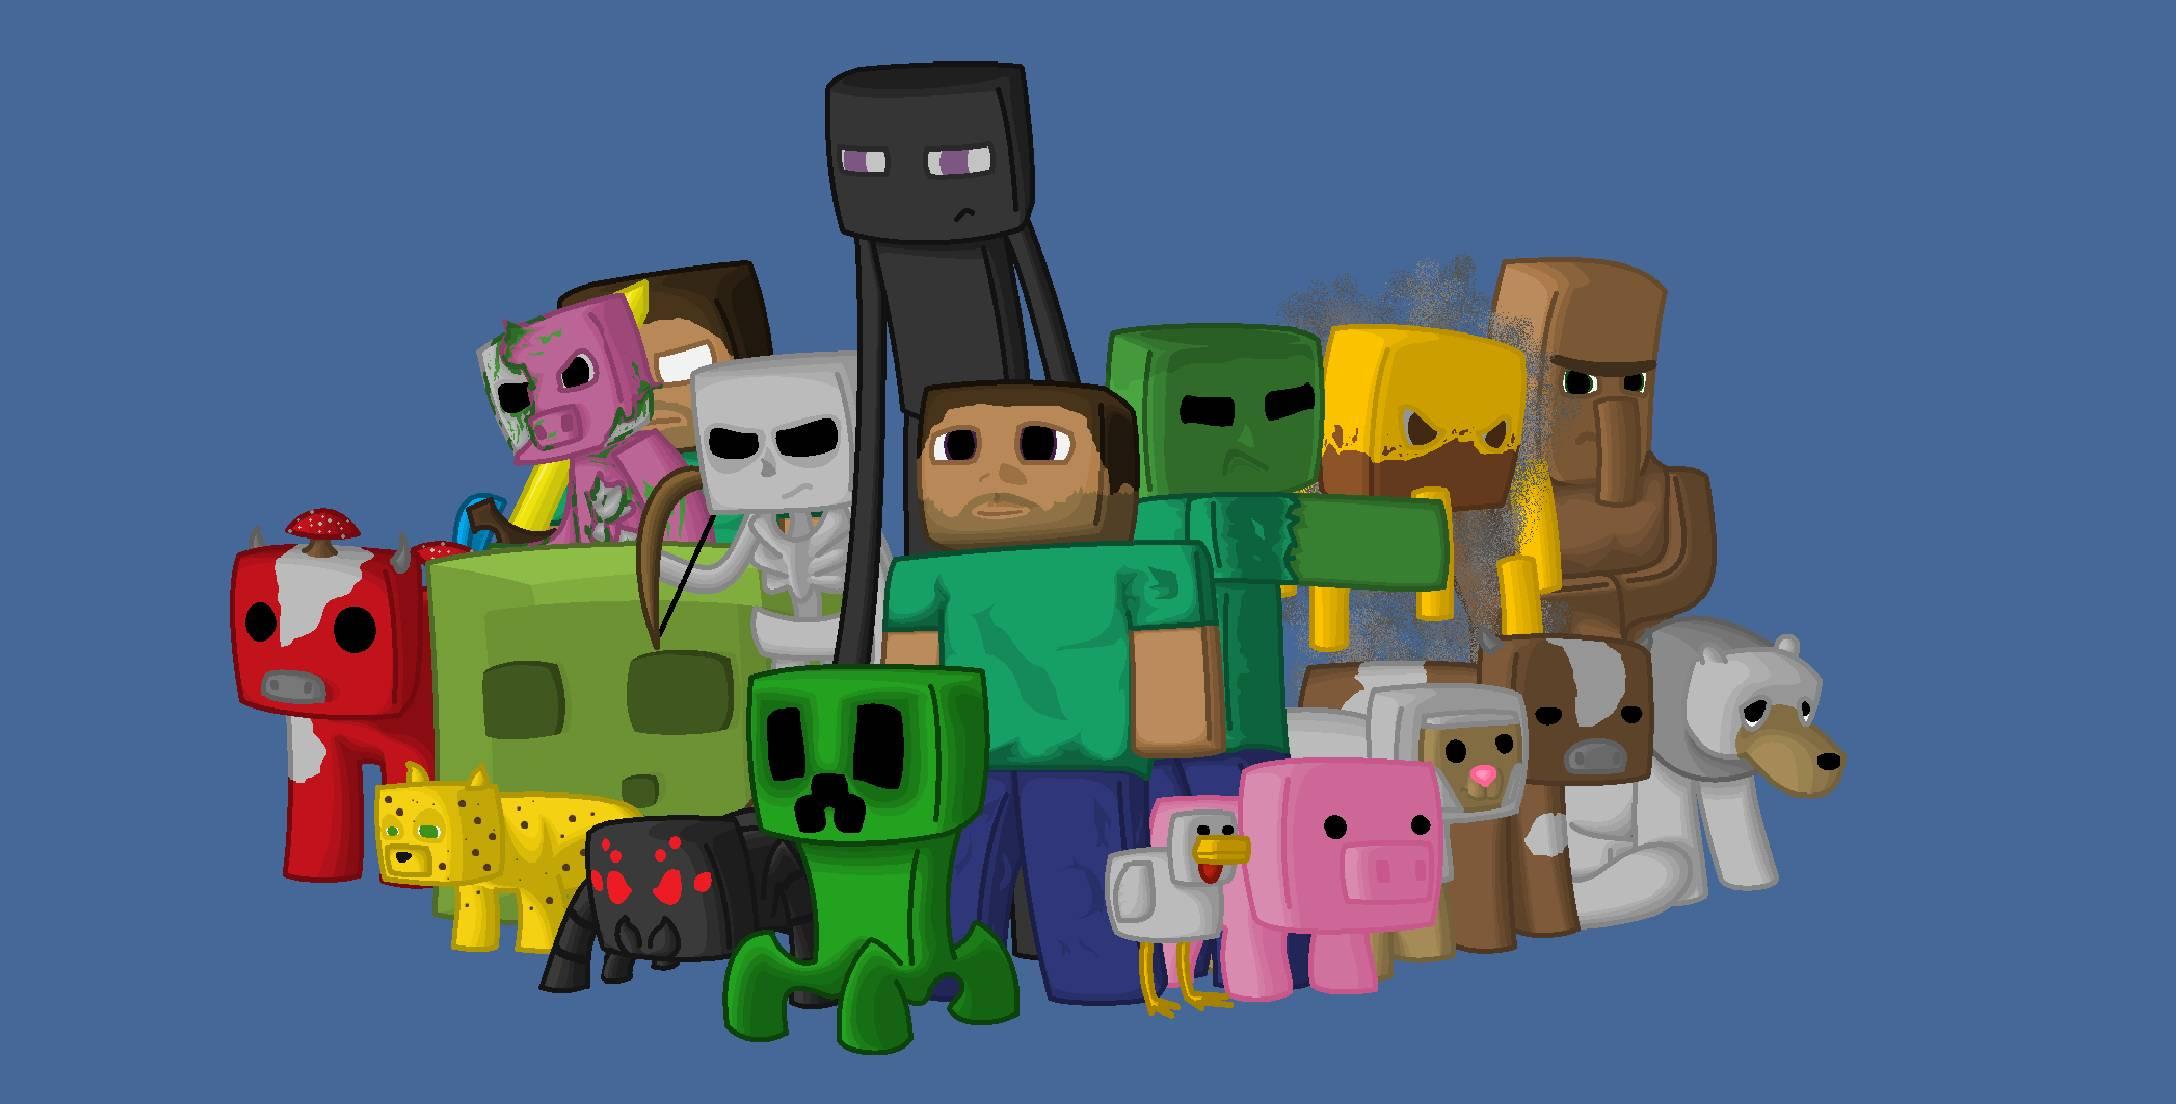 Fond Décran Illustration Minecraft Dessin Animé Pixels